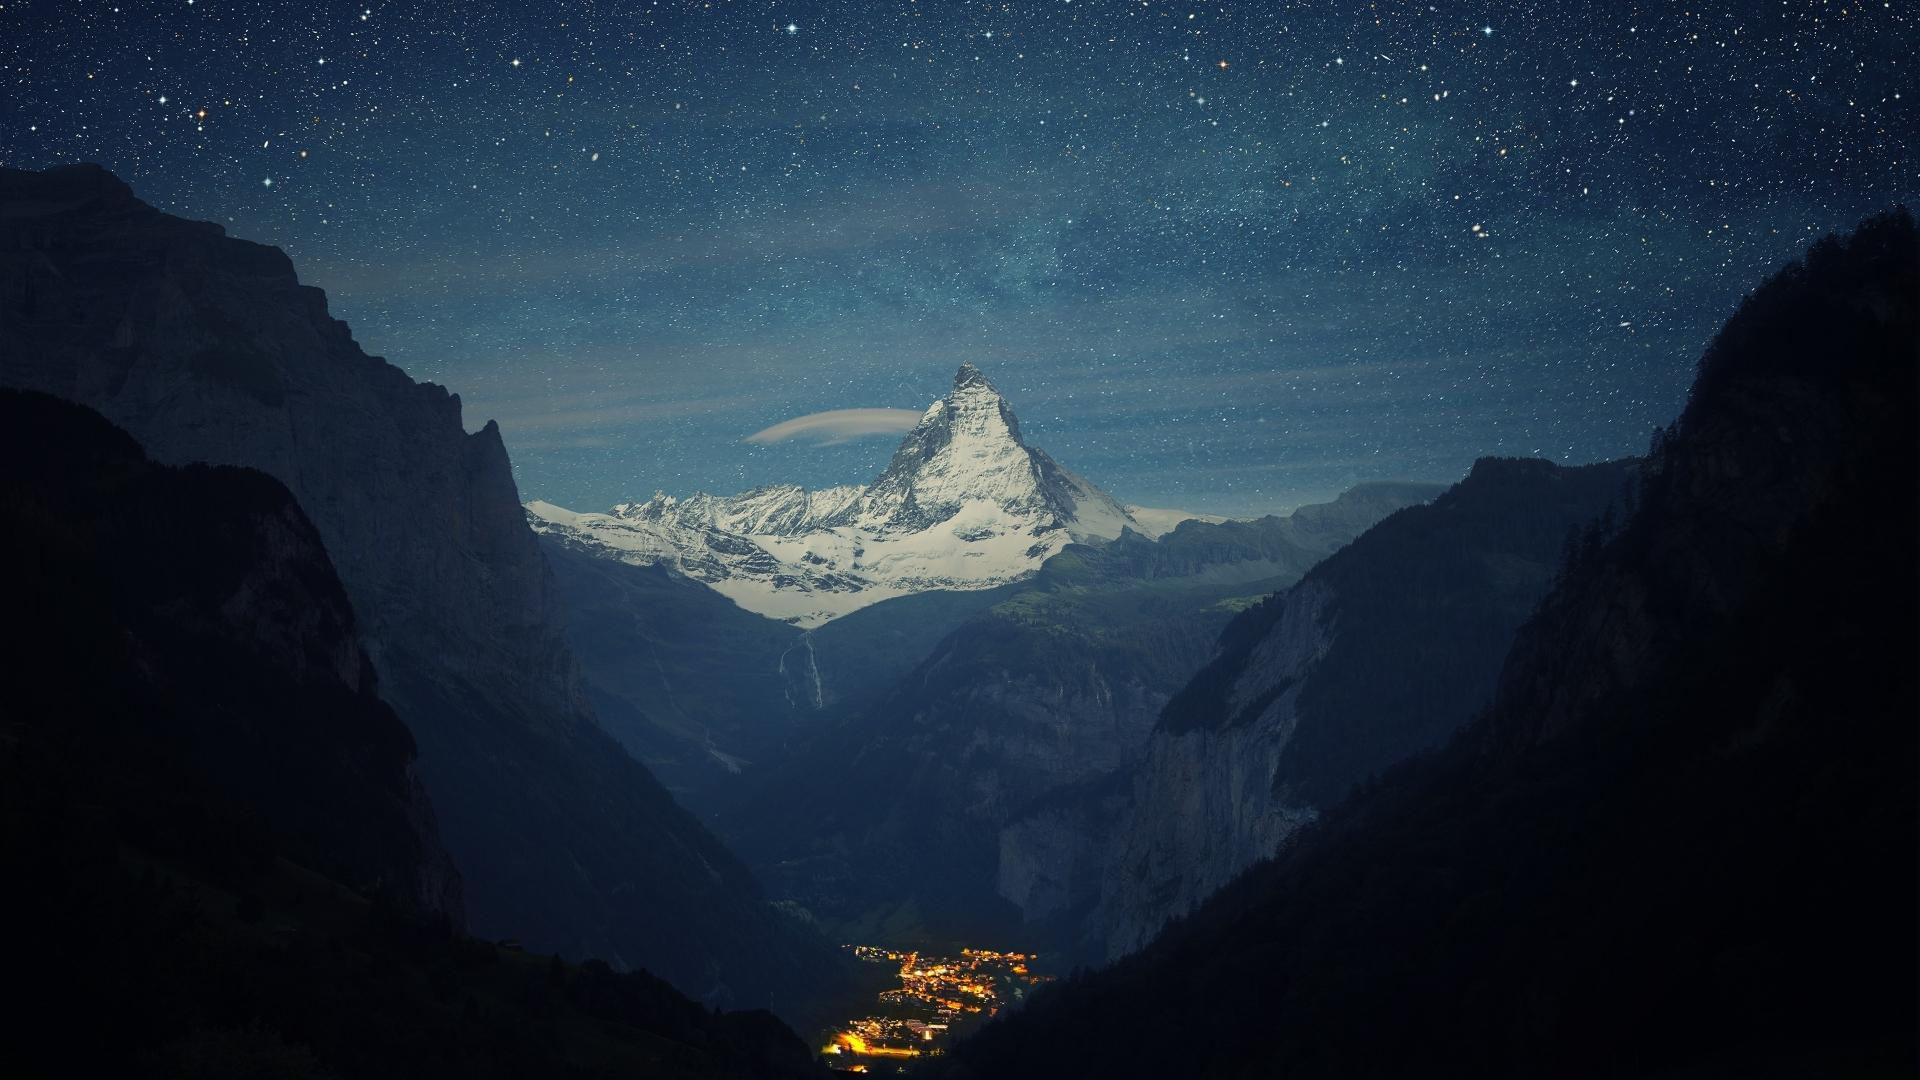 Zermatt-Matterhorn Aerial View at Night Wallpaper in 1920x1080 Resolution